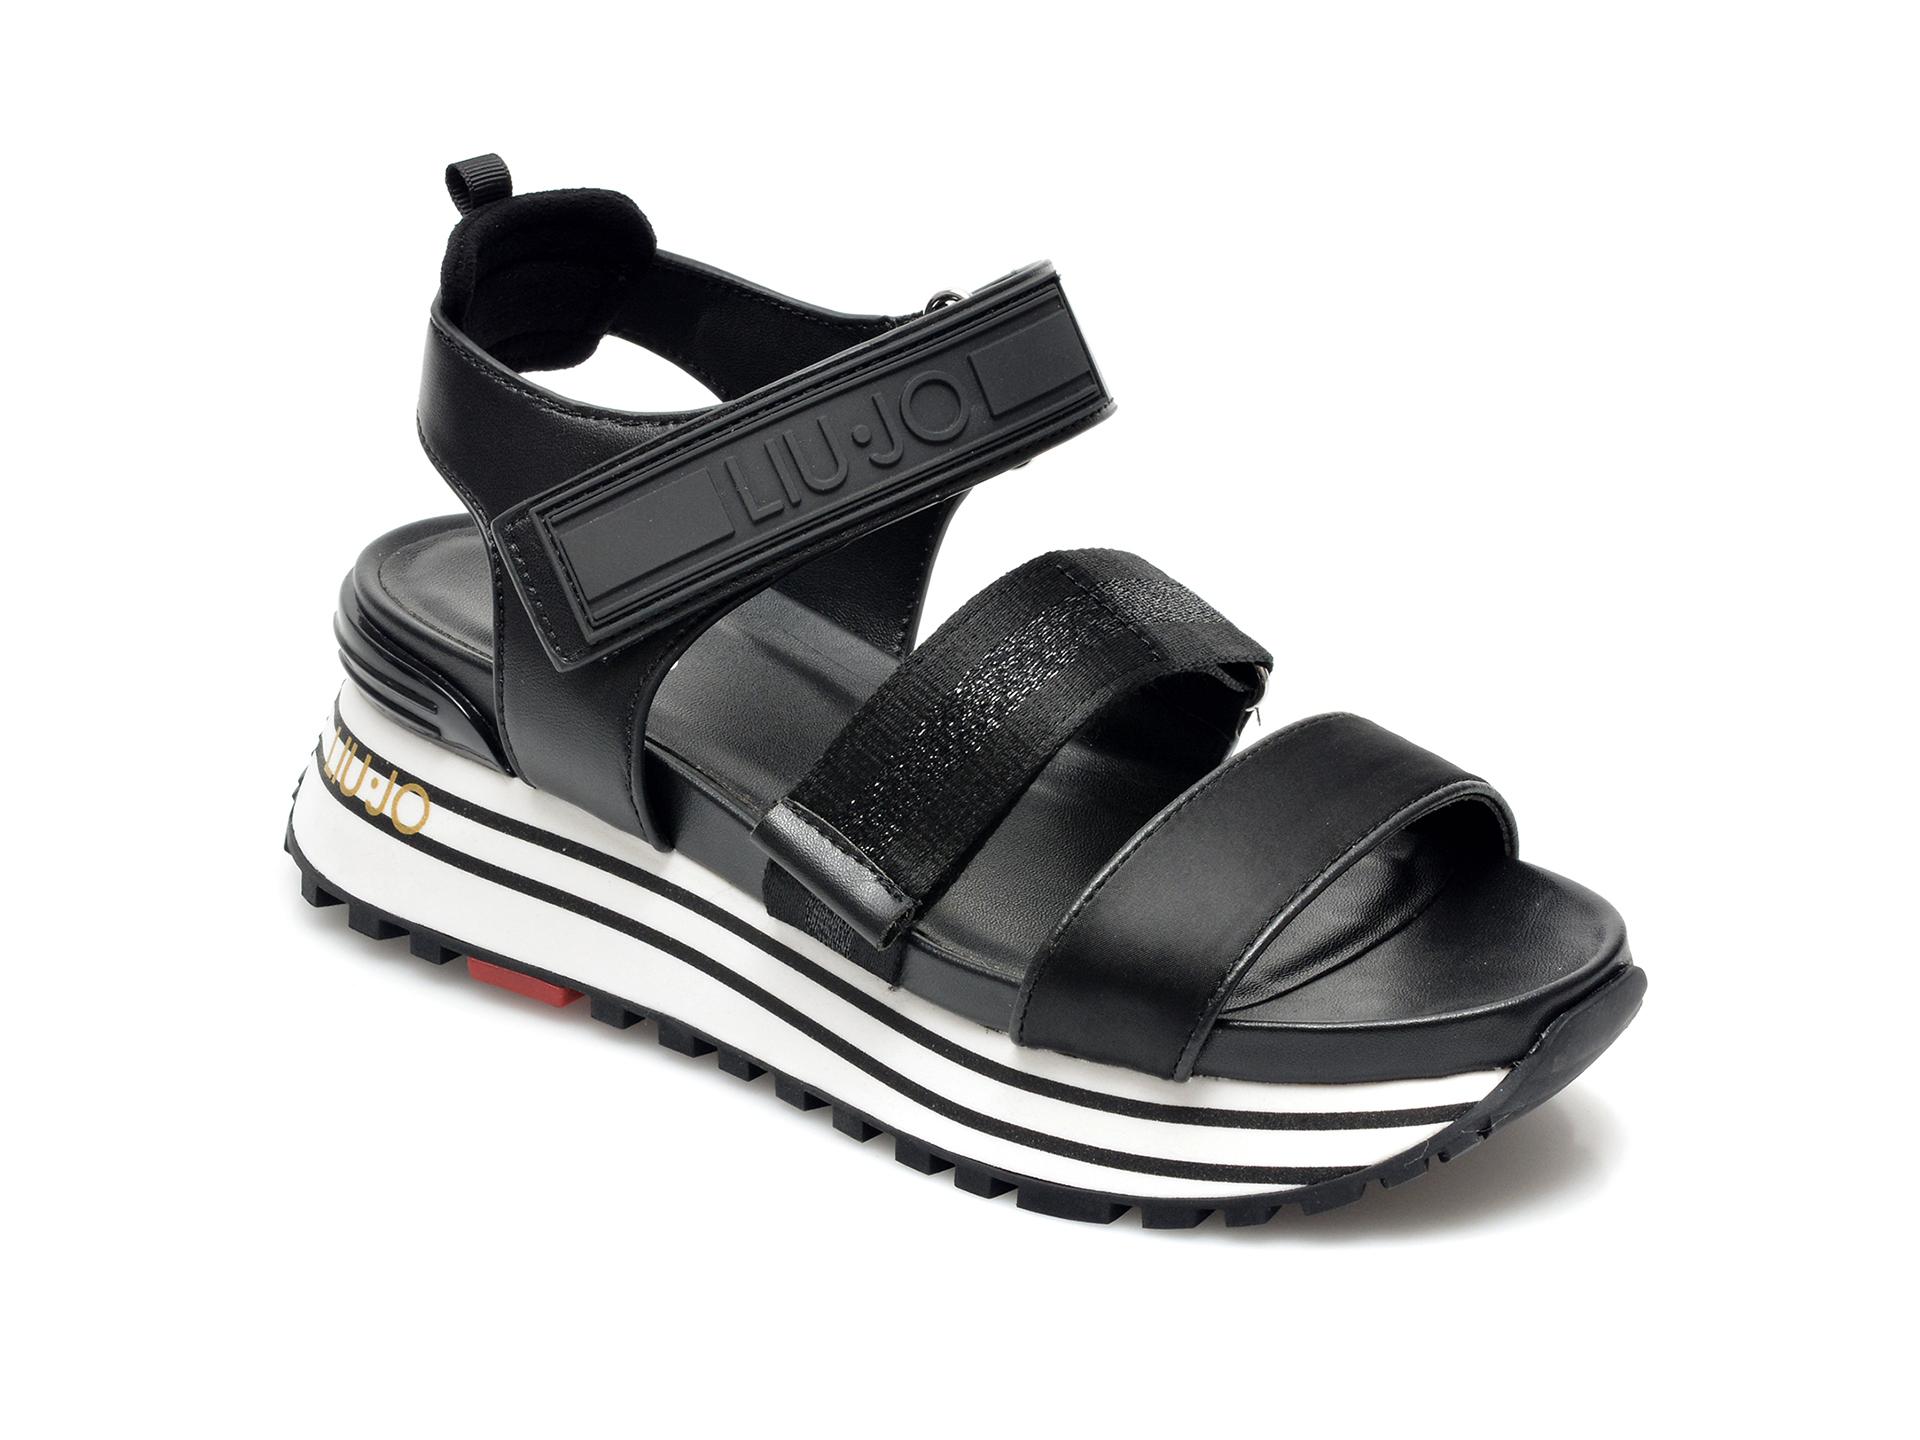 Sandale LIU JO negre, Maxi Wonder Sandal 7, din material textil si piele ecologica